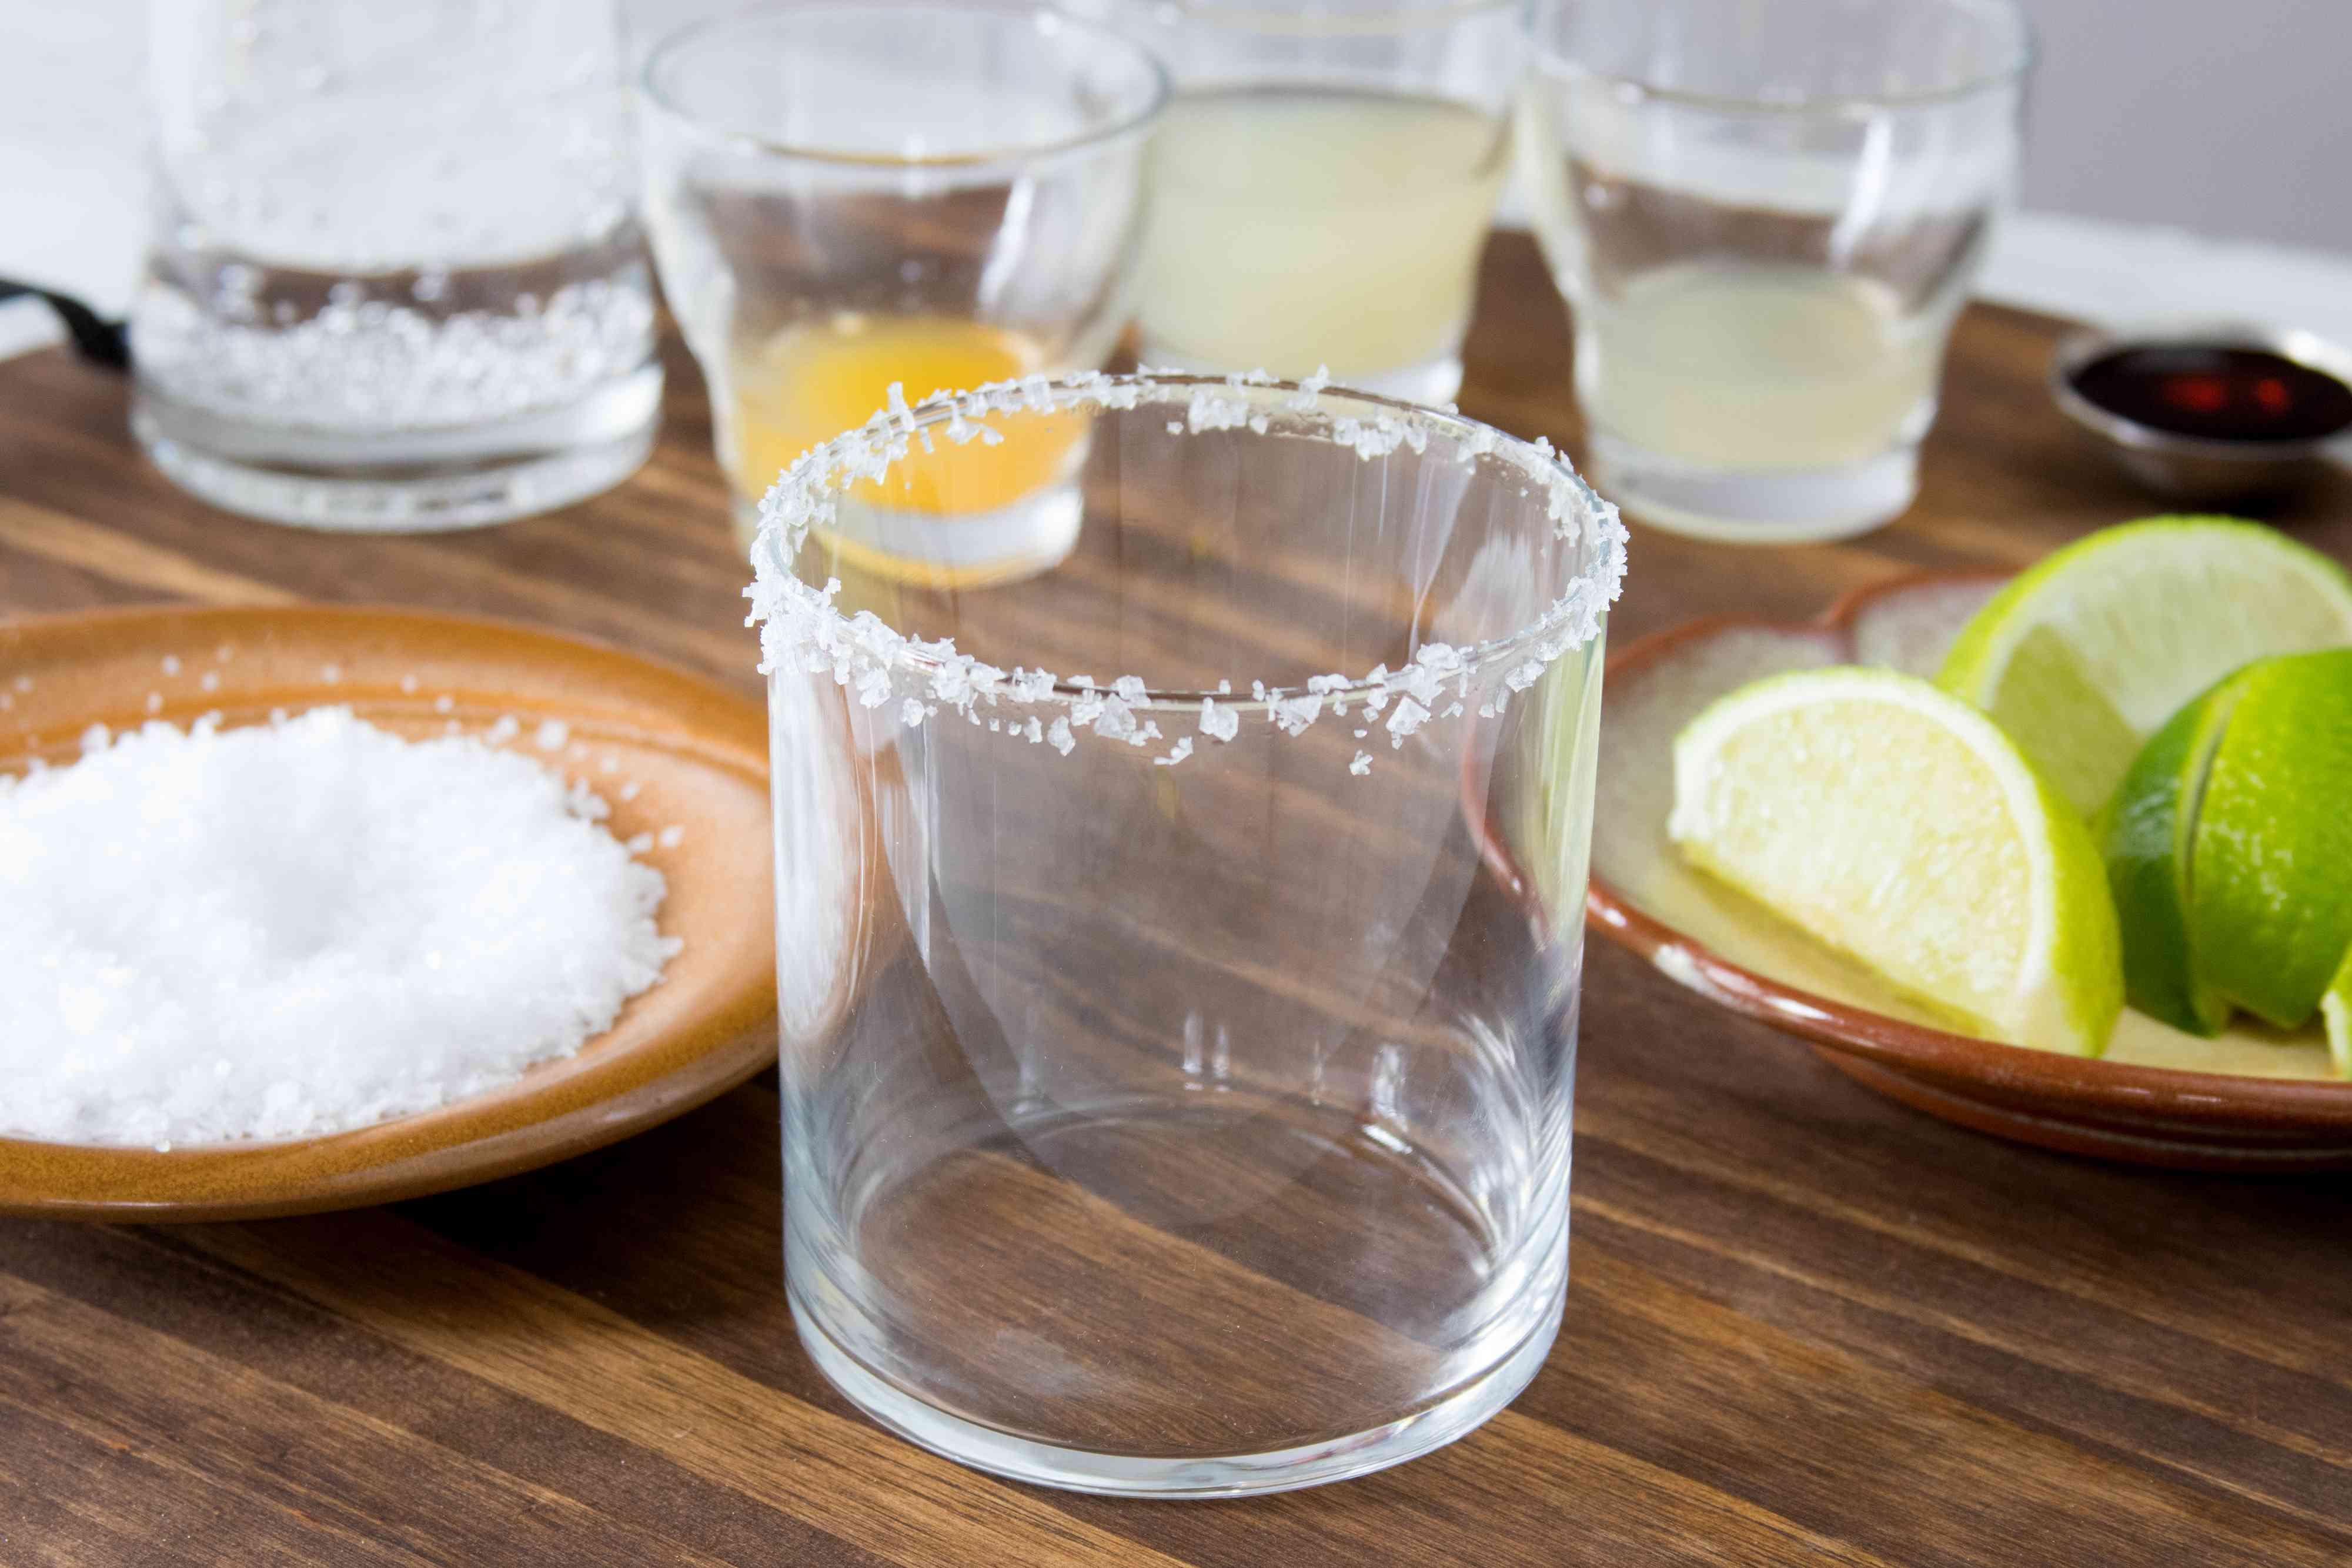 Rimming a Virgin Margarita Glass With Salt